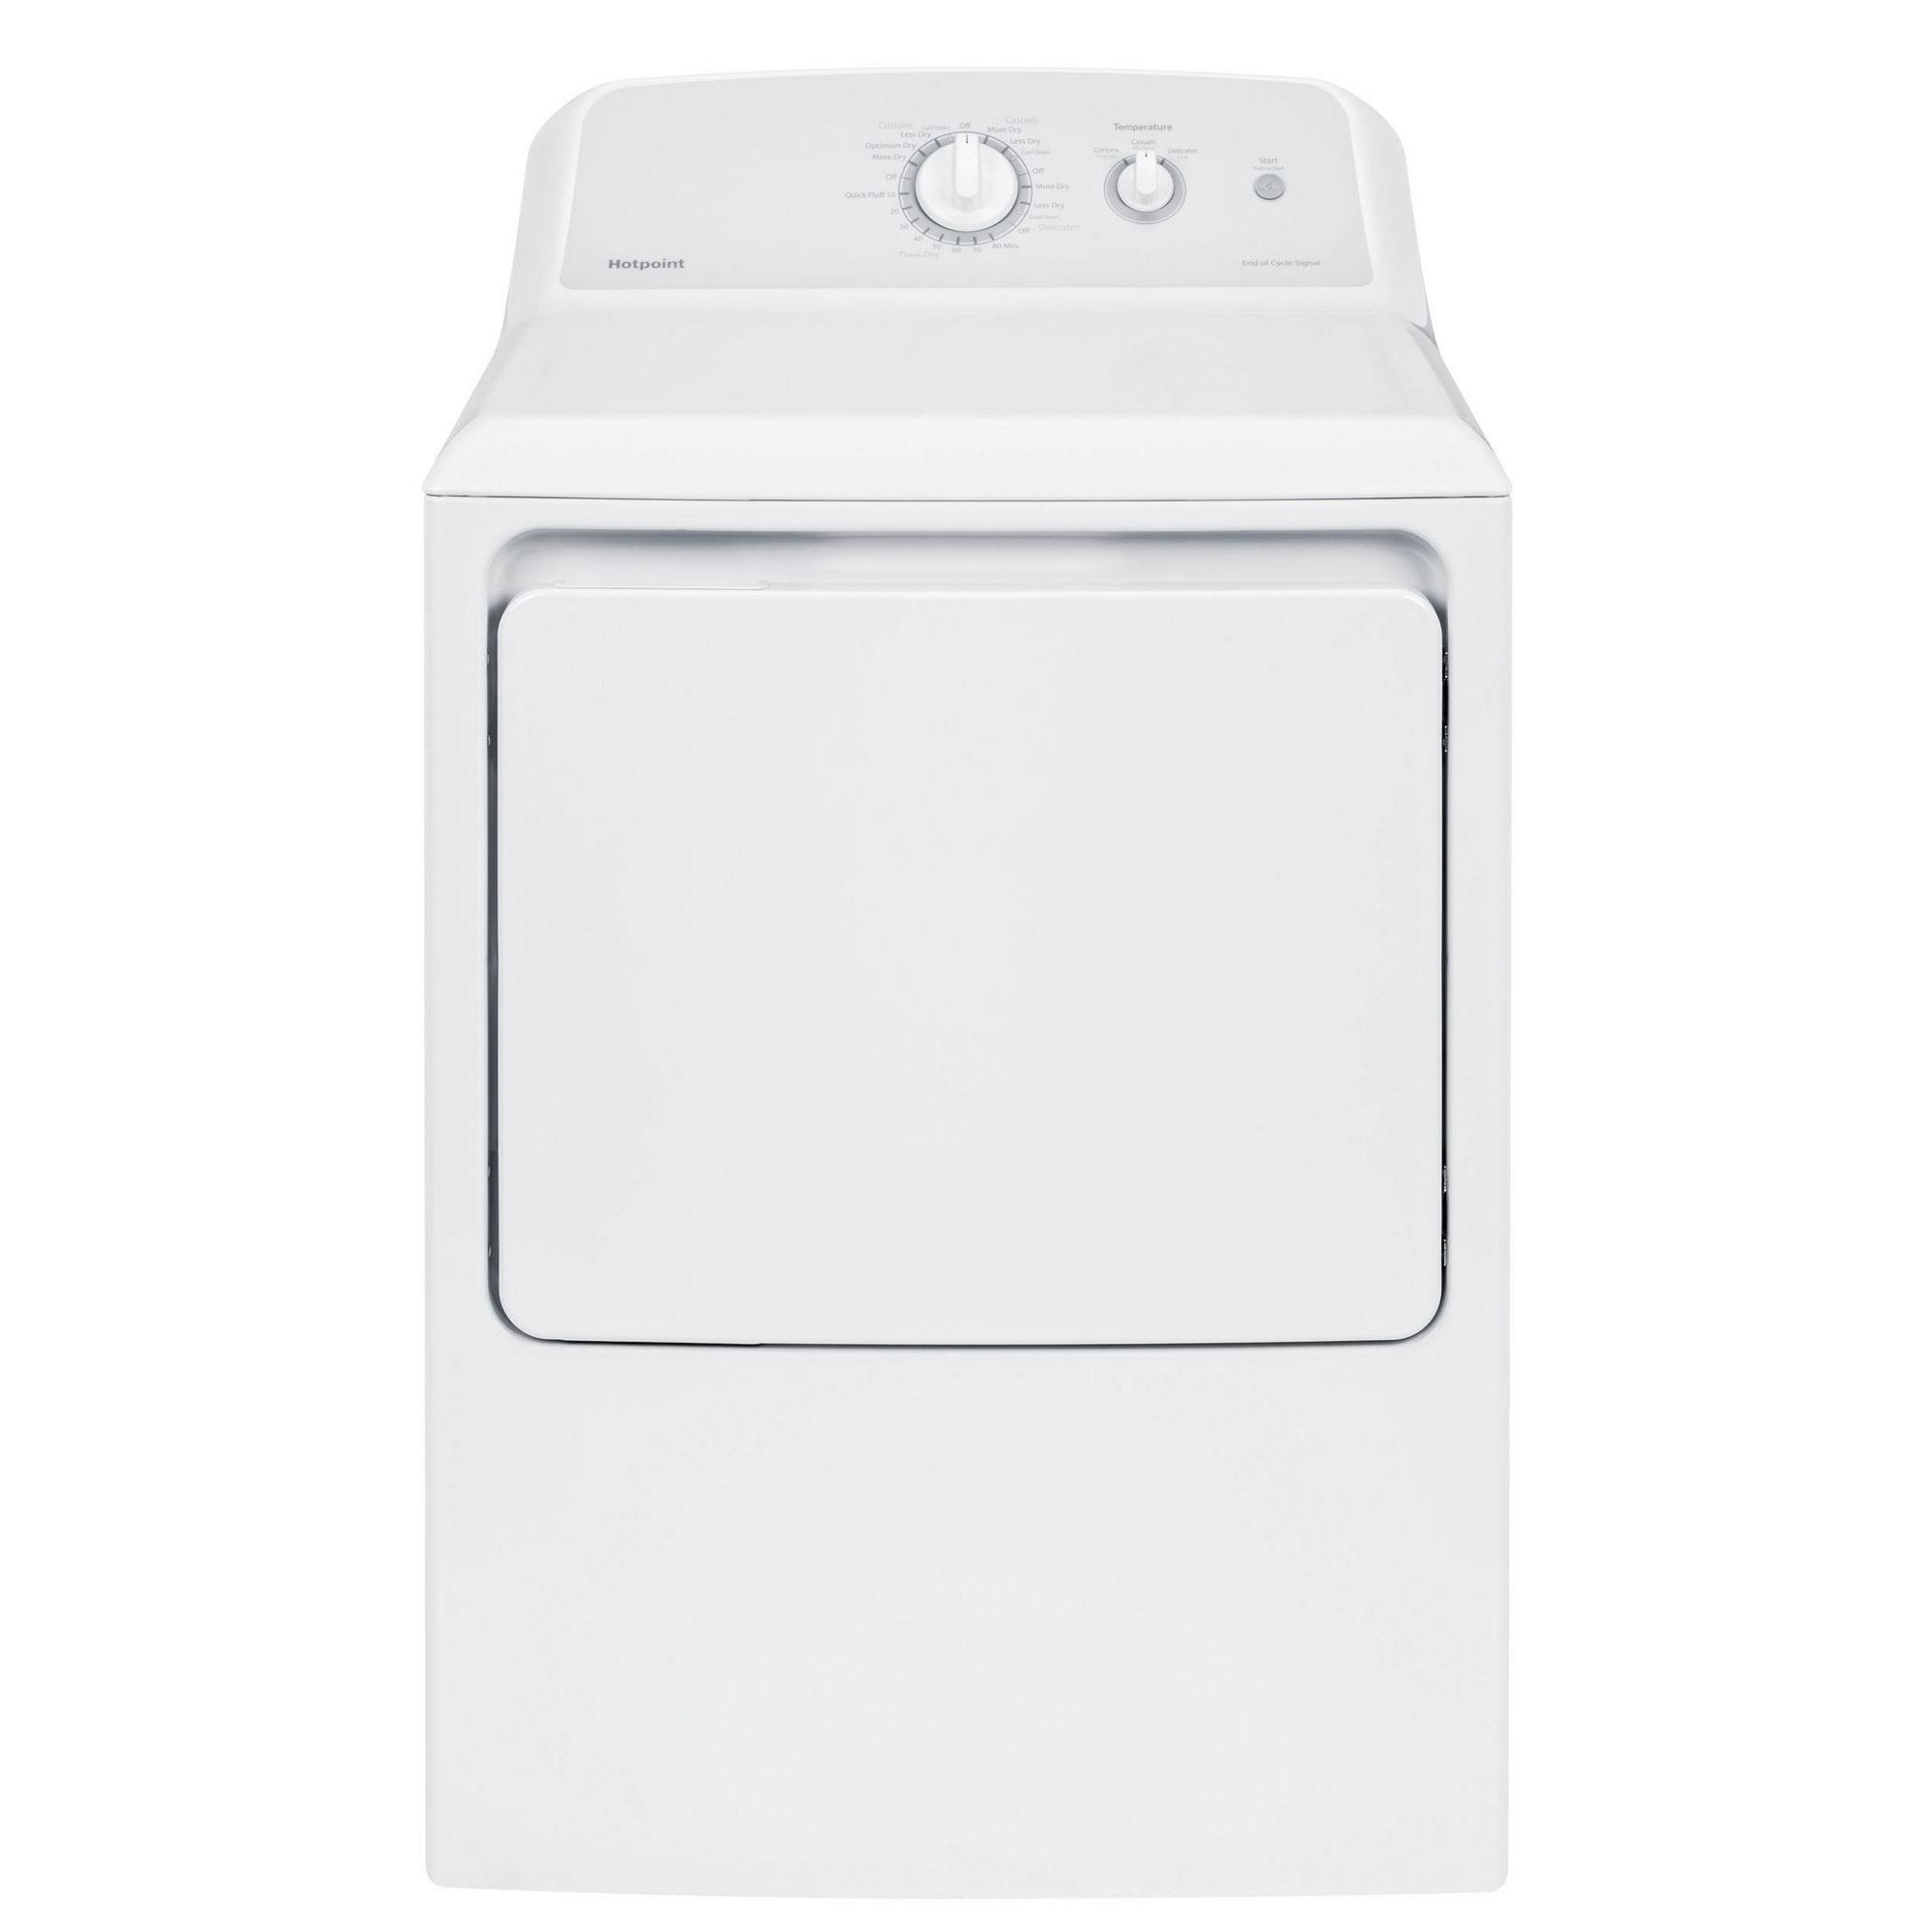 Hotpoint 6.2 cu. ft. Aluminized Alloy Gas Dryer - HTX24GASKWS